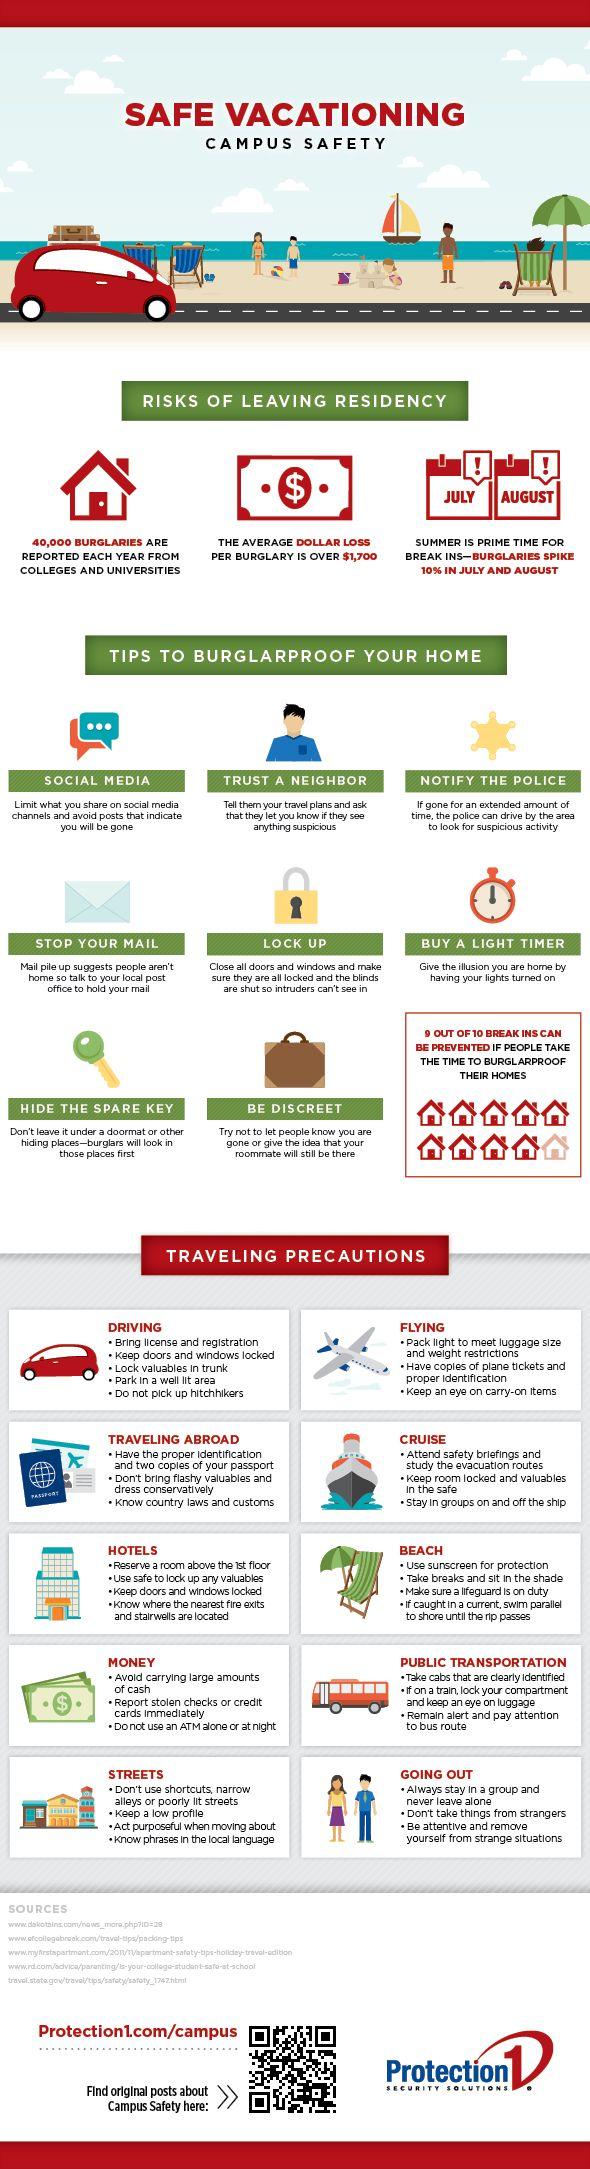 Summer travel safety tips best travel tips